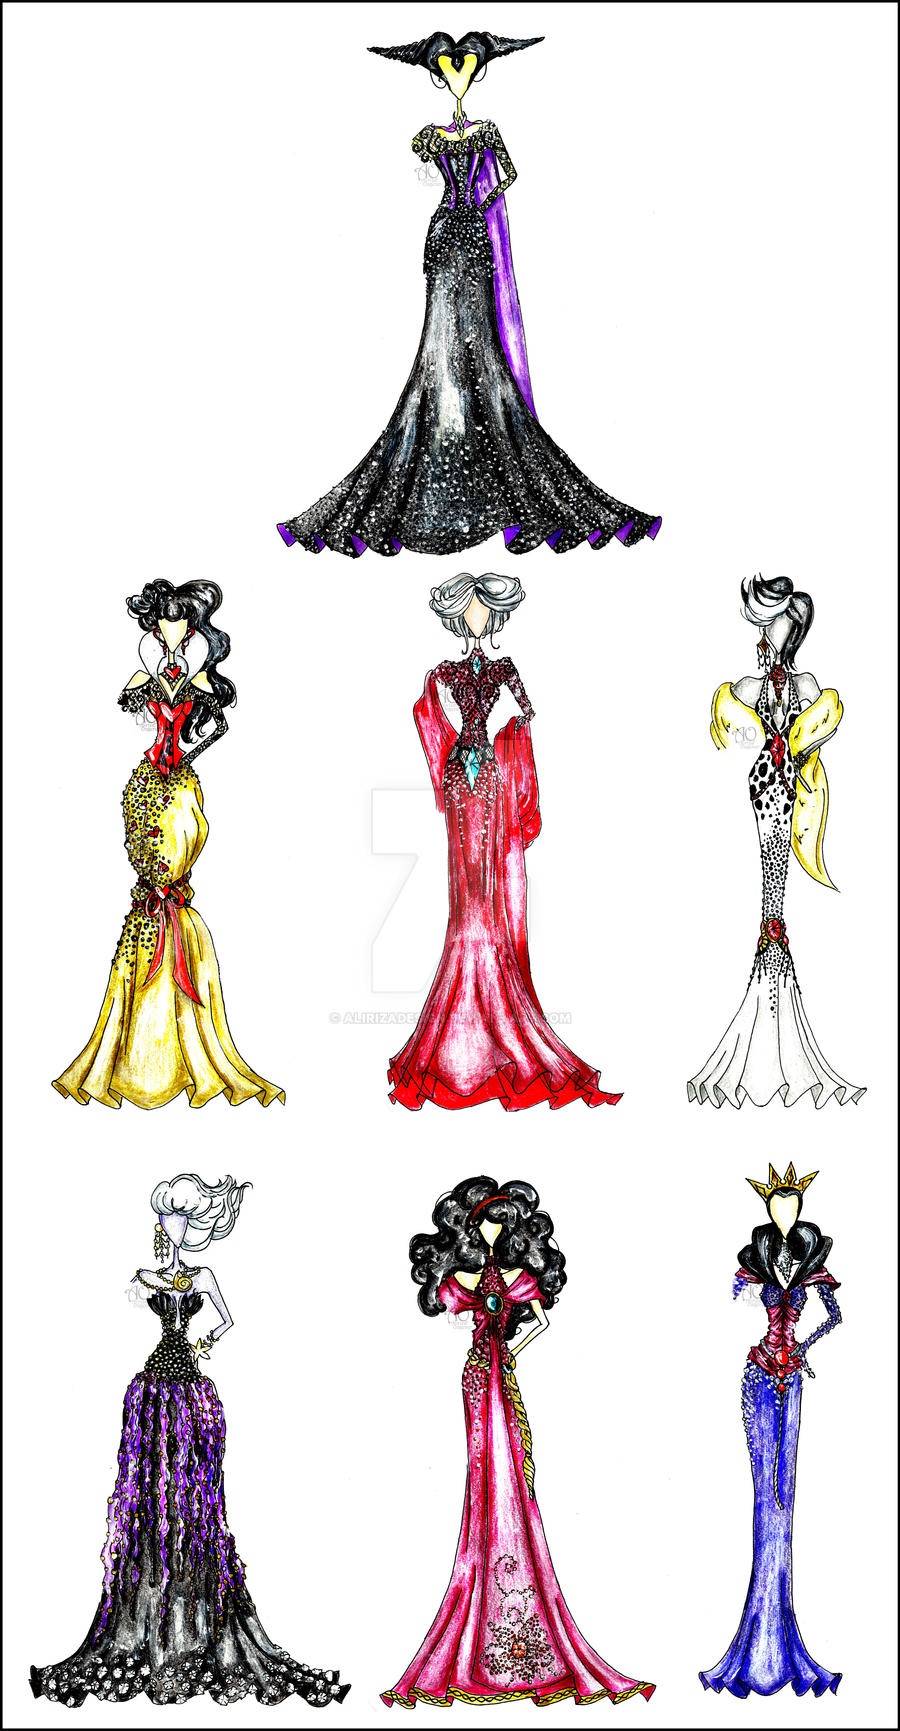 Disney Villain Fashion by AlirizaDesign